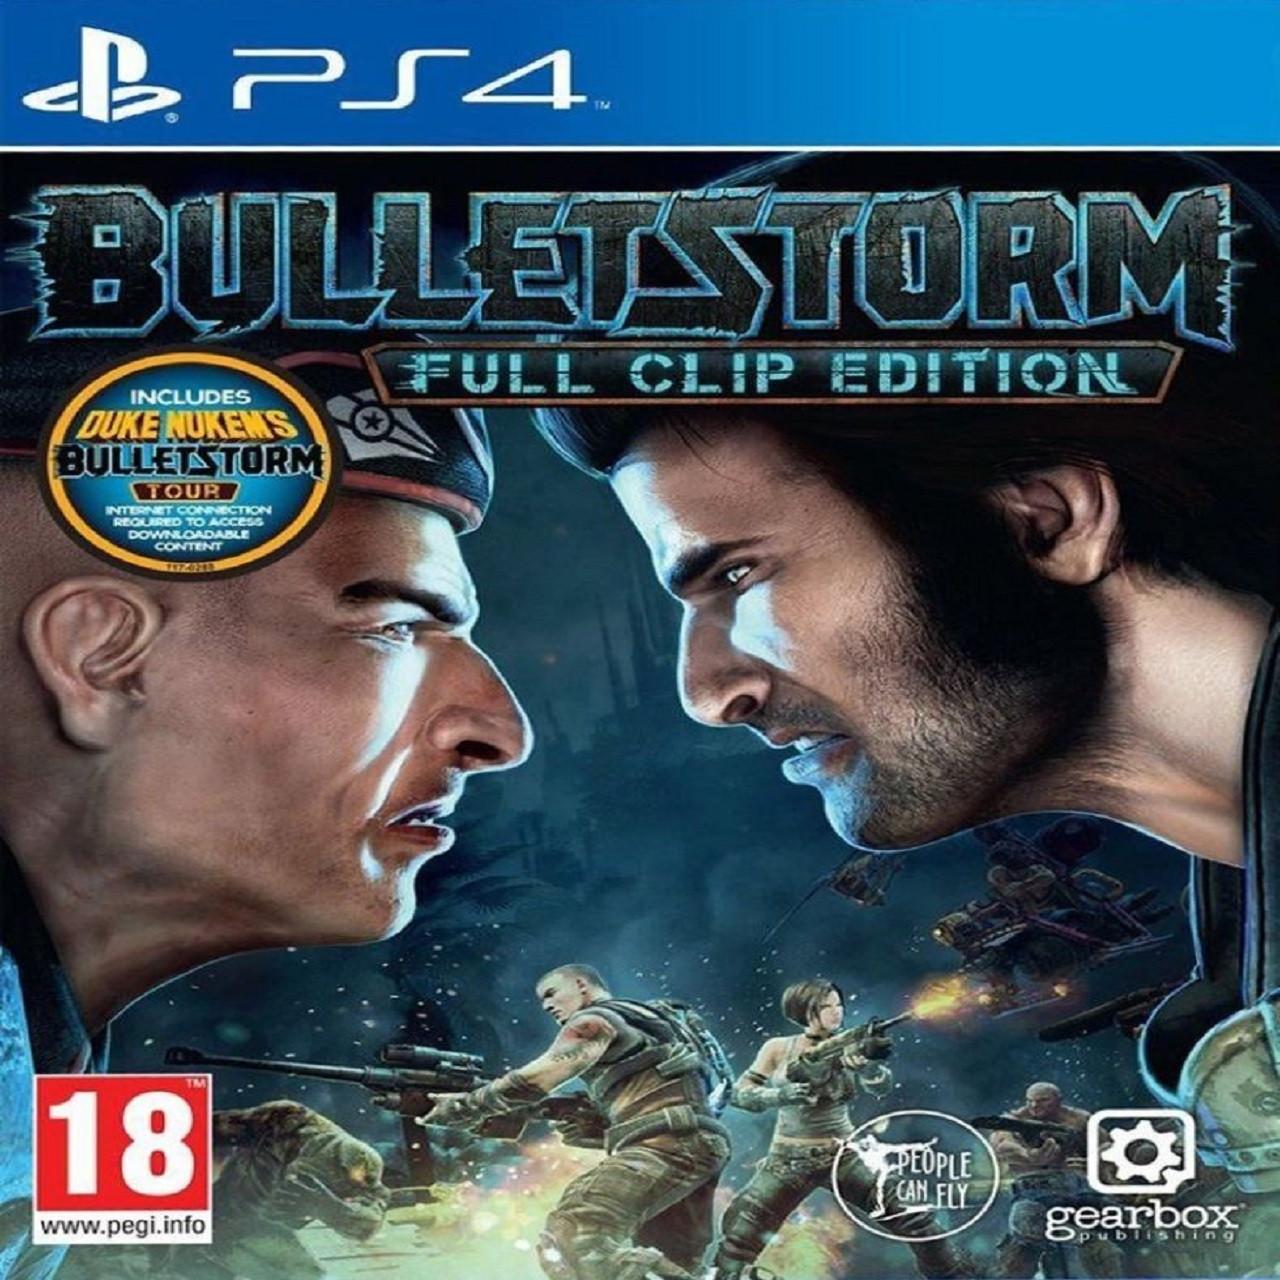 Bulletstorm Full Clip Edition RUS PS4  (NEW)